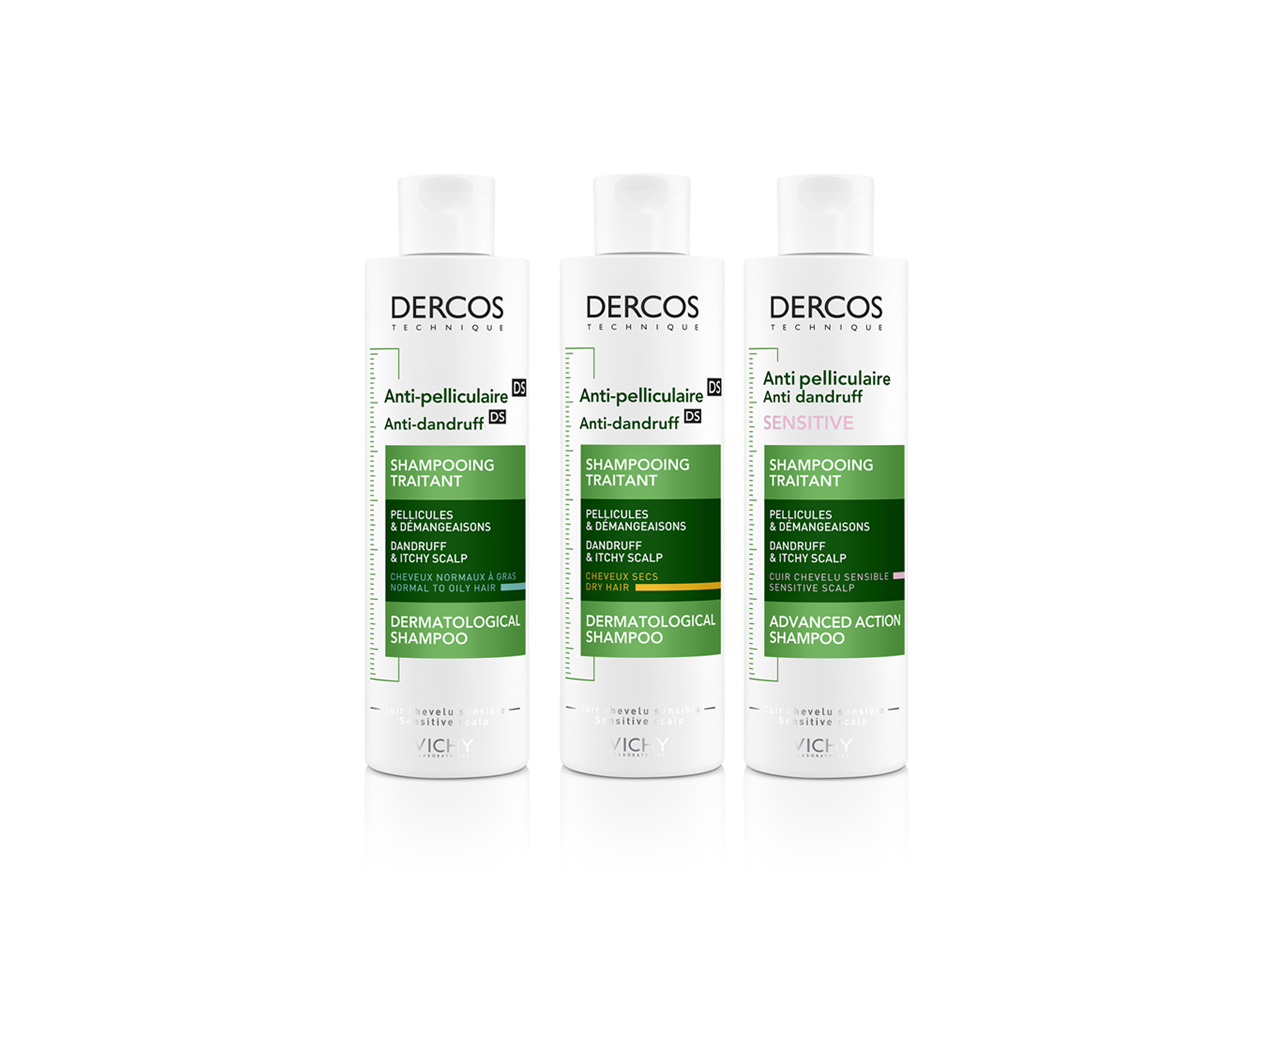 Anti-Dandruff DS dermatological shampoo - dandruff & itchy scalp – dry hair